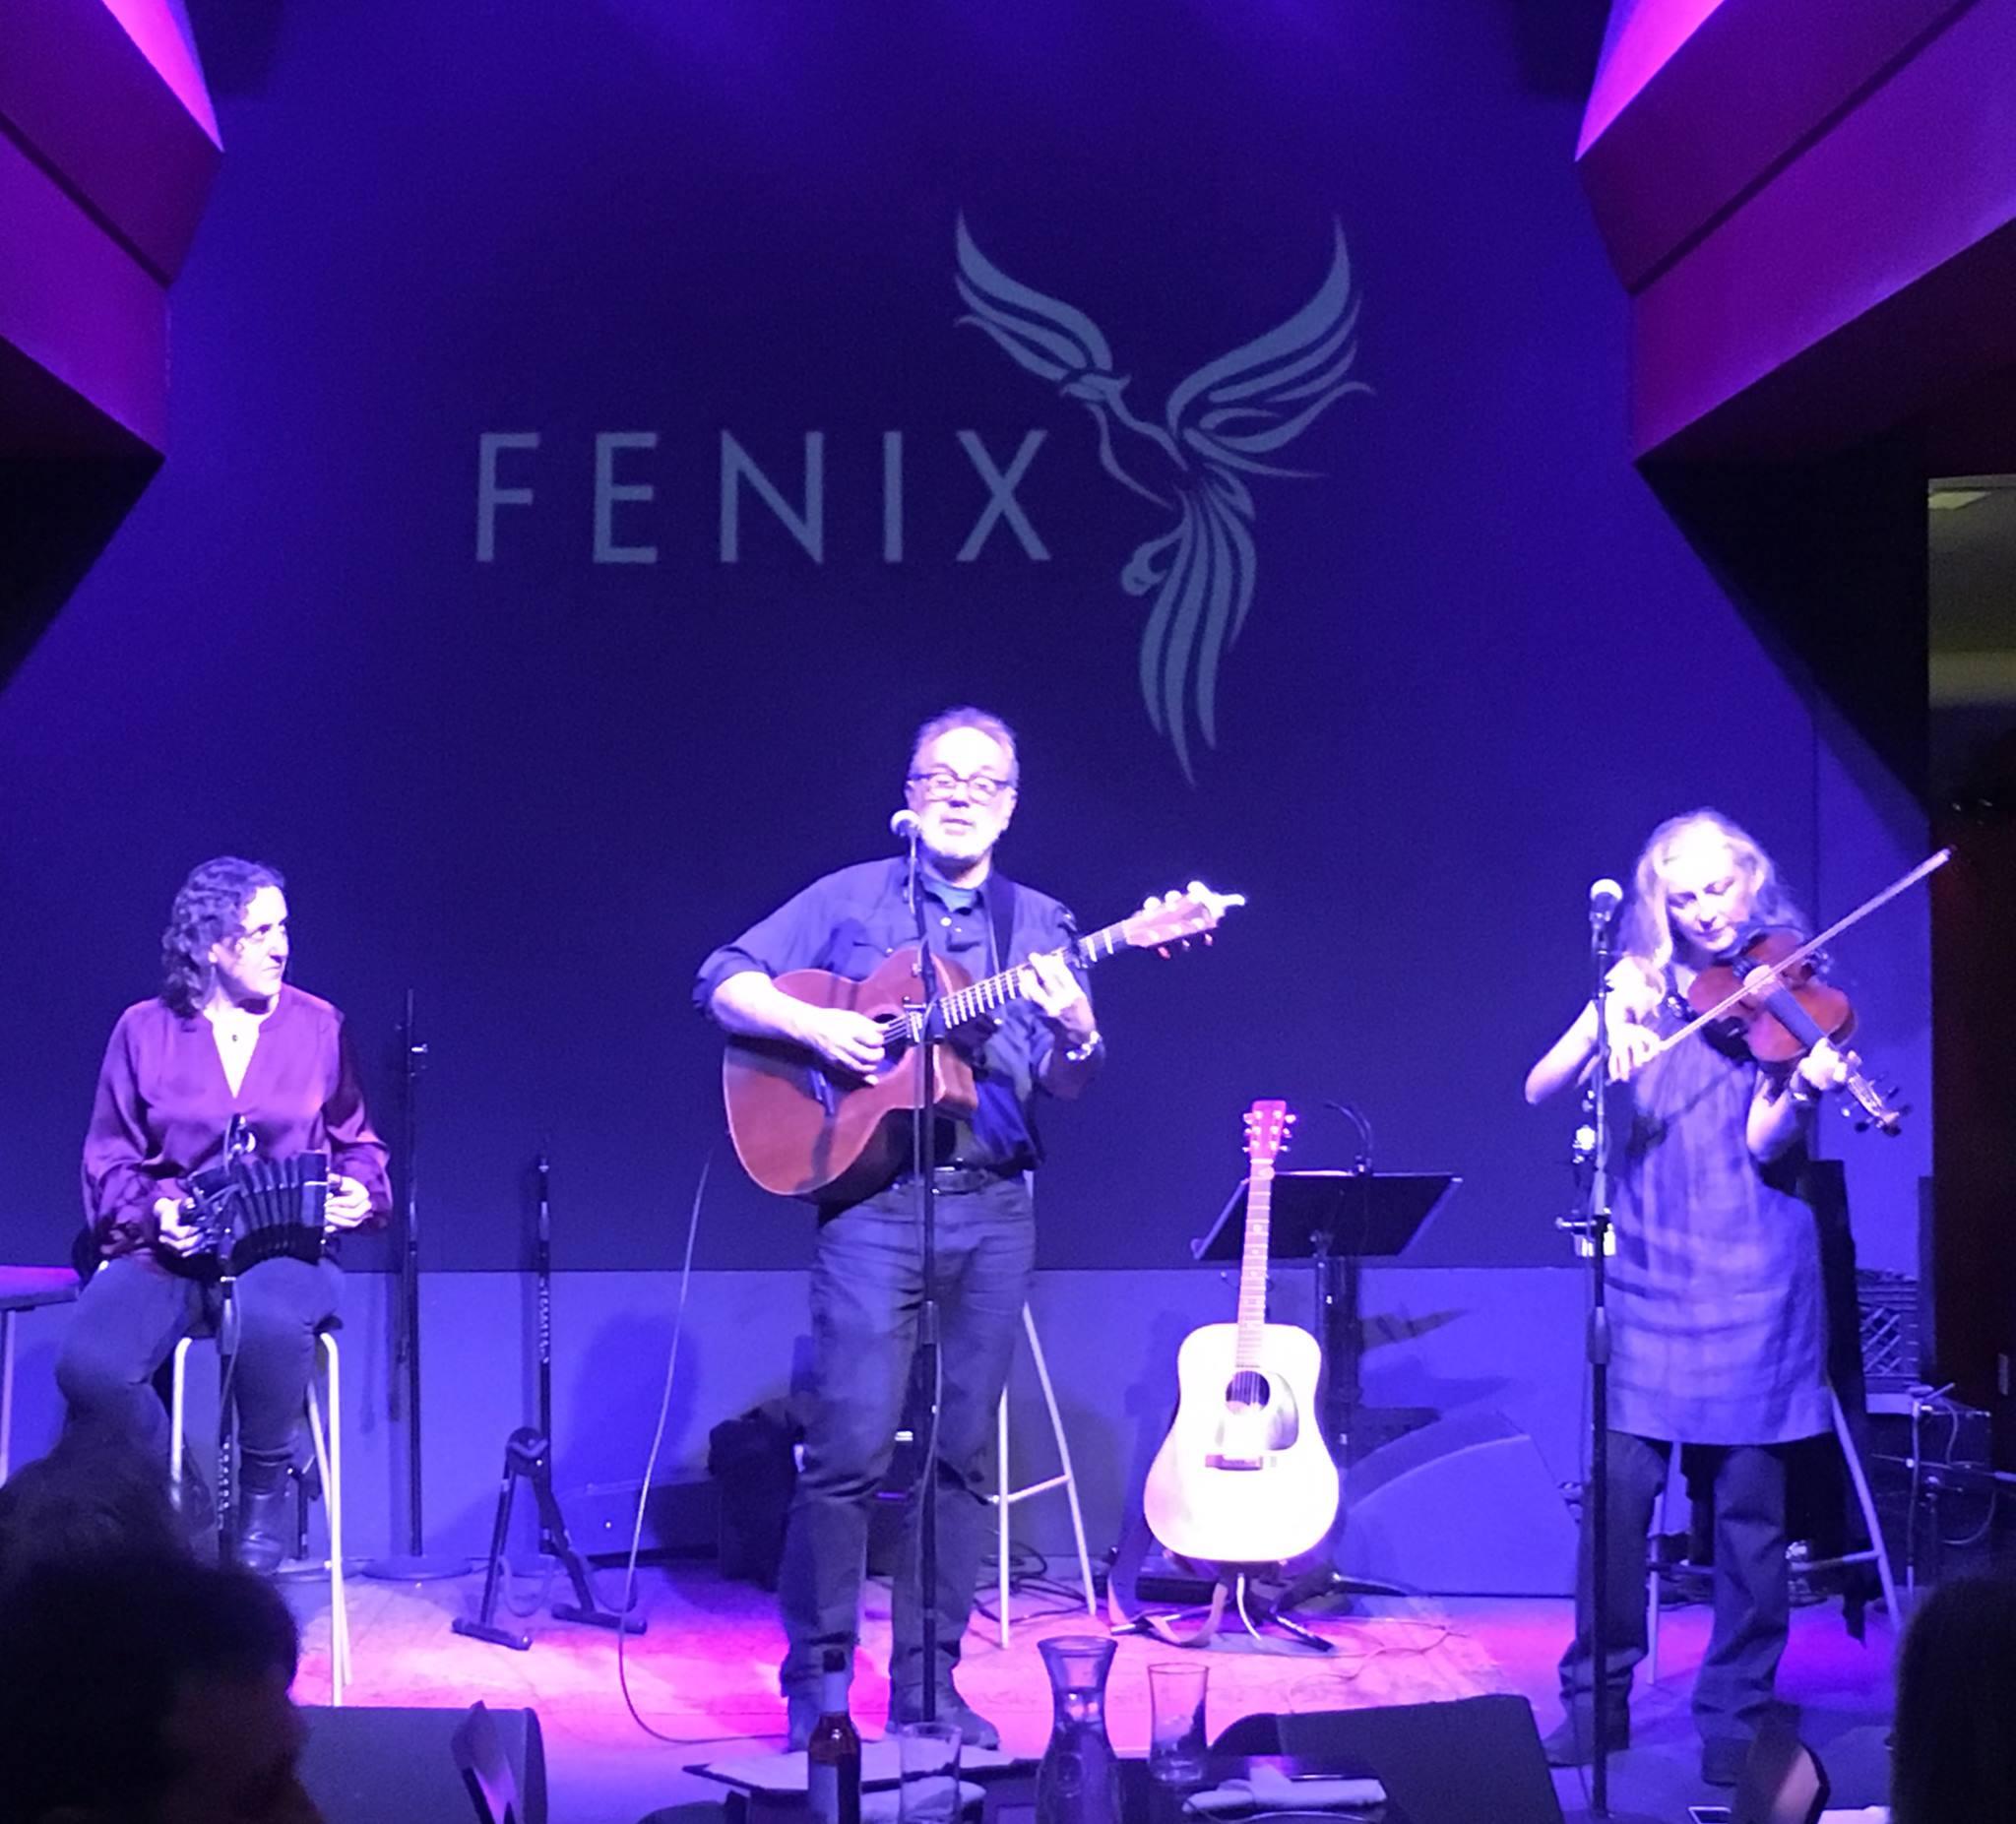 - Friday, February 24, 6:30-9pmKyle Alden, Rebecca Richman and Suzuki CadyThe Fenix Theater, San Rafael